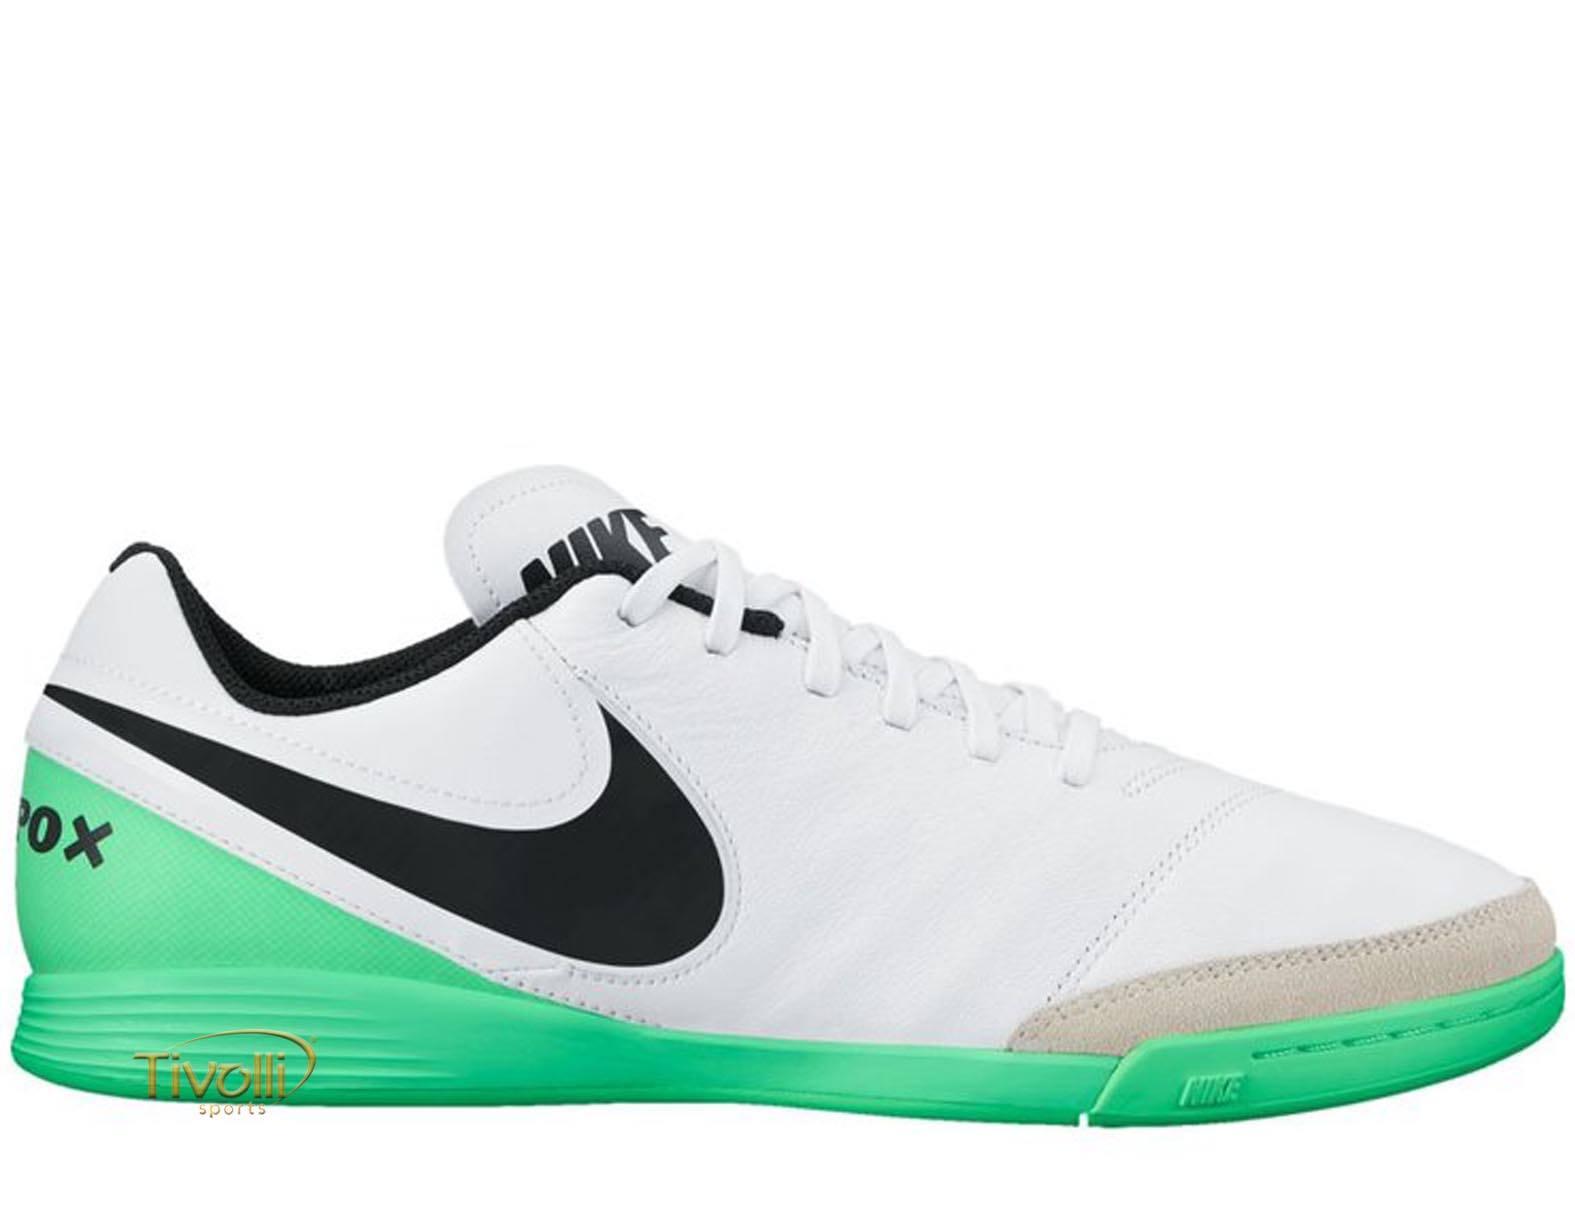 Chuteira Nike TiempoX Genio II Leather IC Futsal     a82fce05b8121